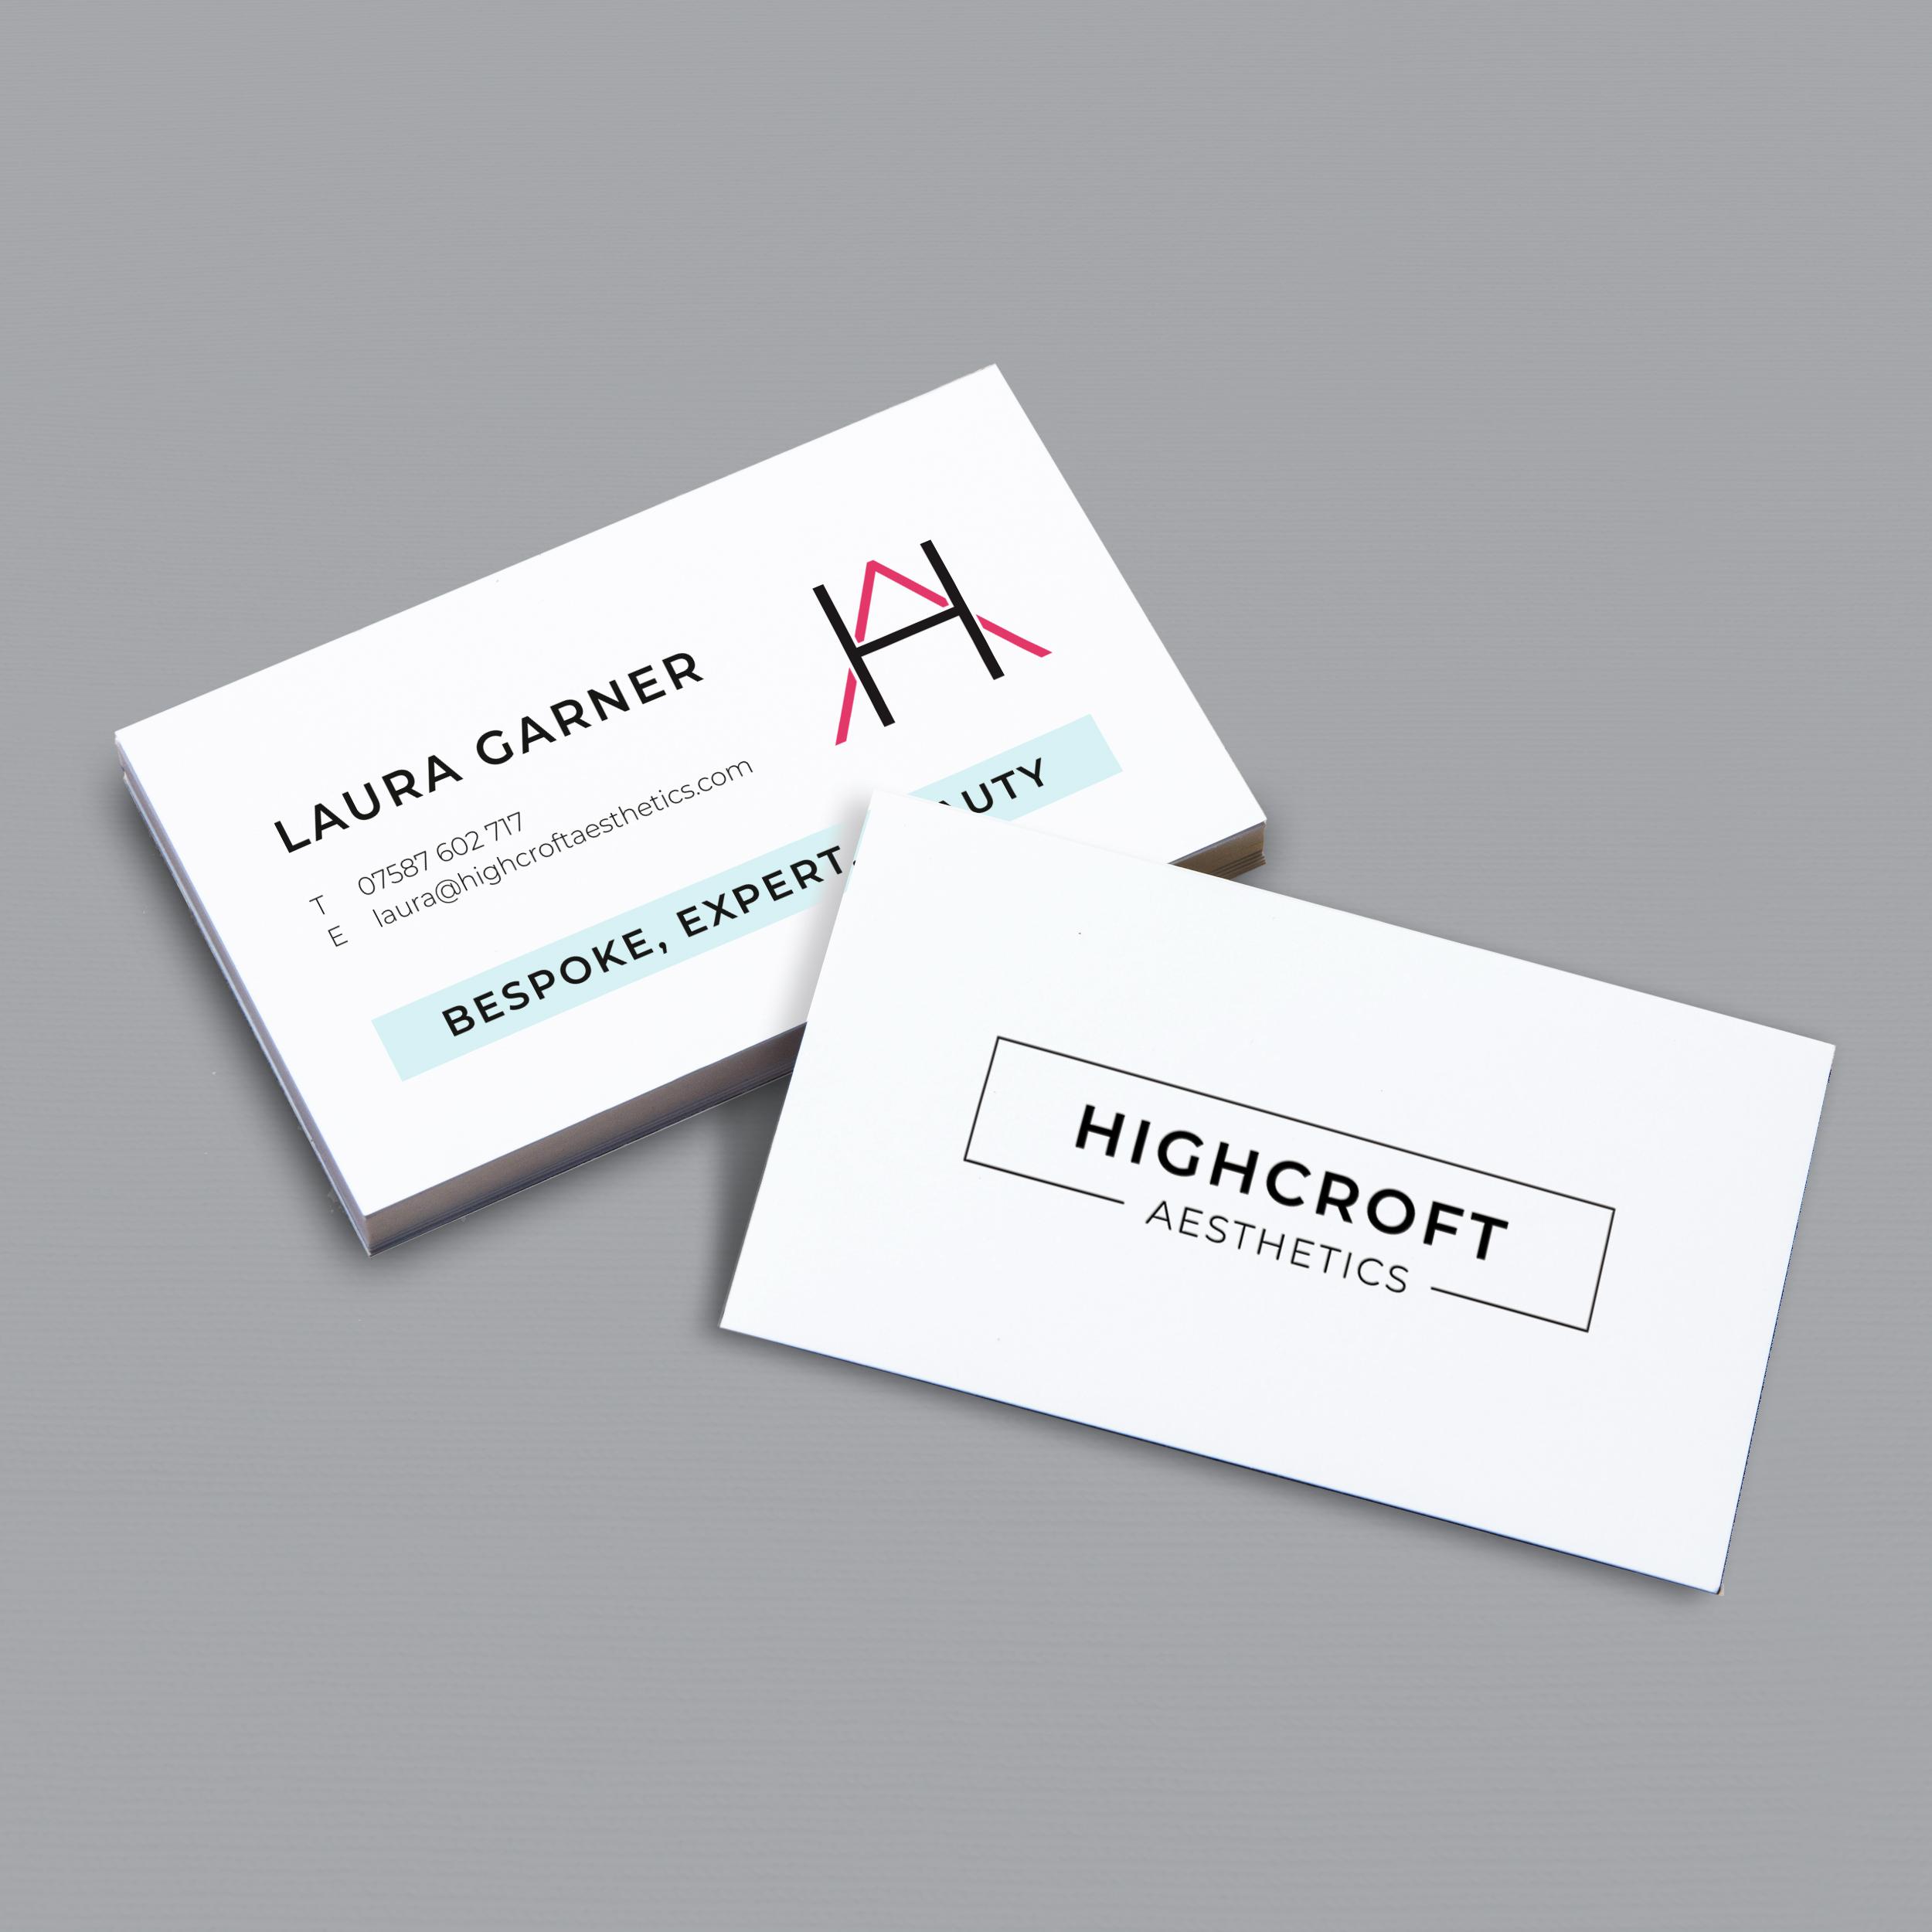 Highcroft Aesthetics Business Cards